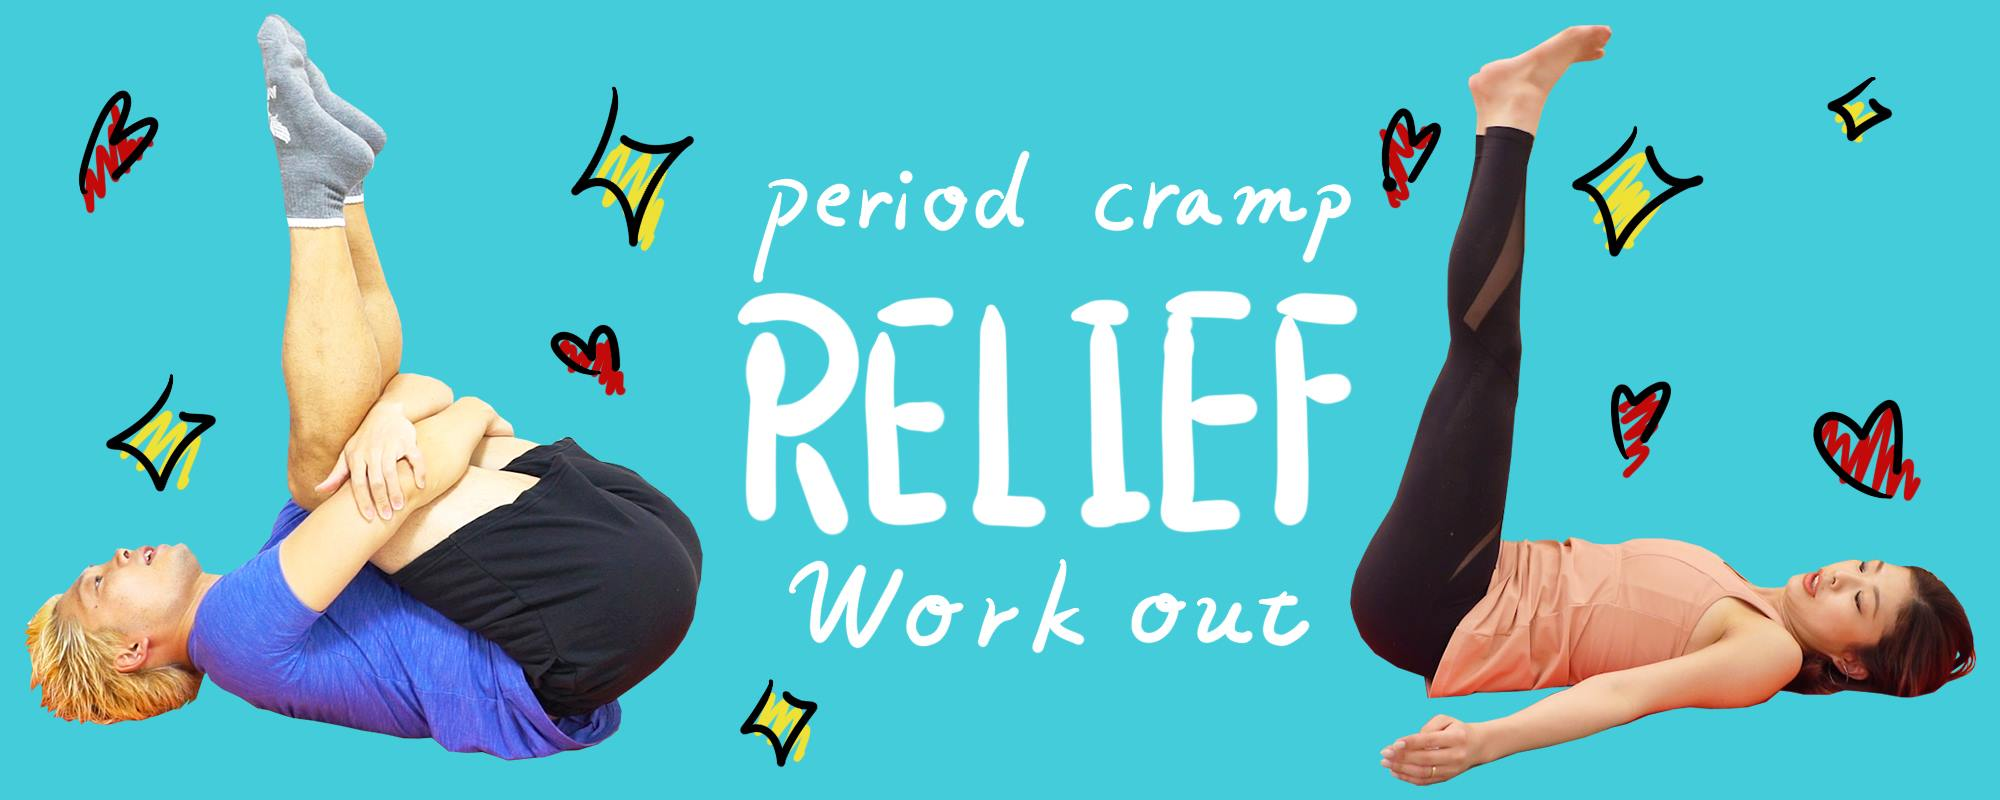 Period cramp relief 4 weeks program